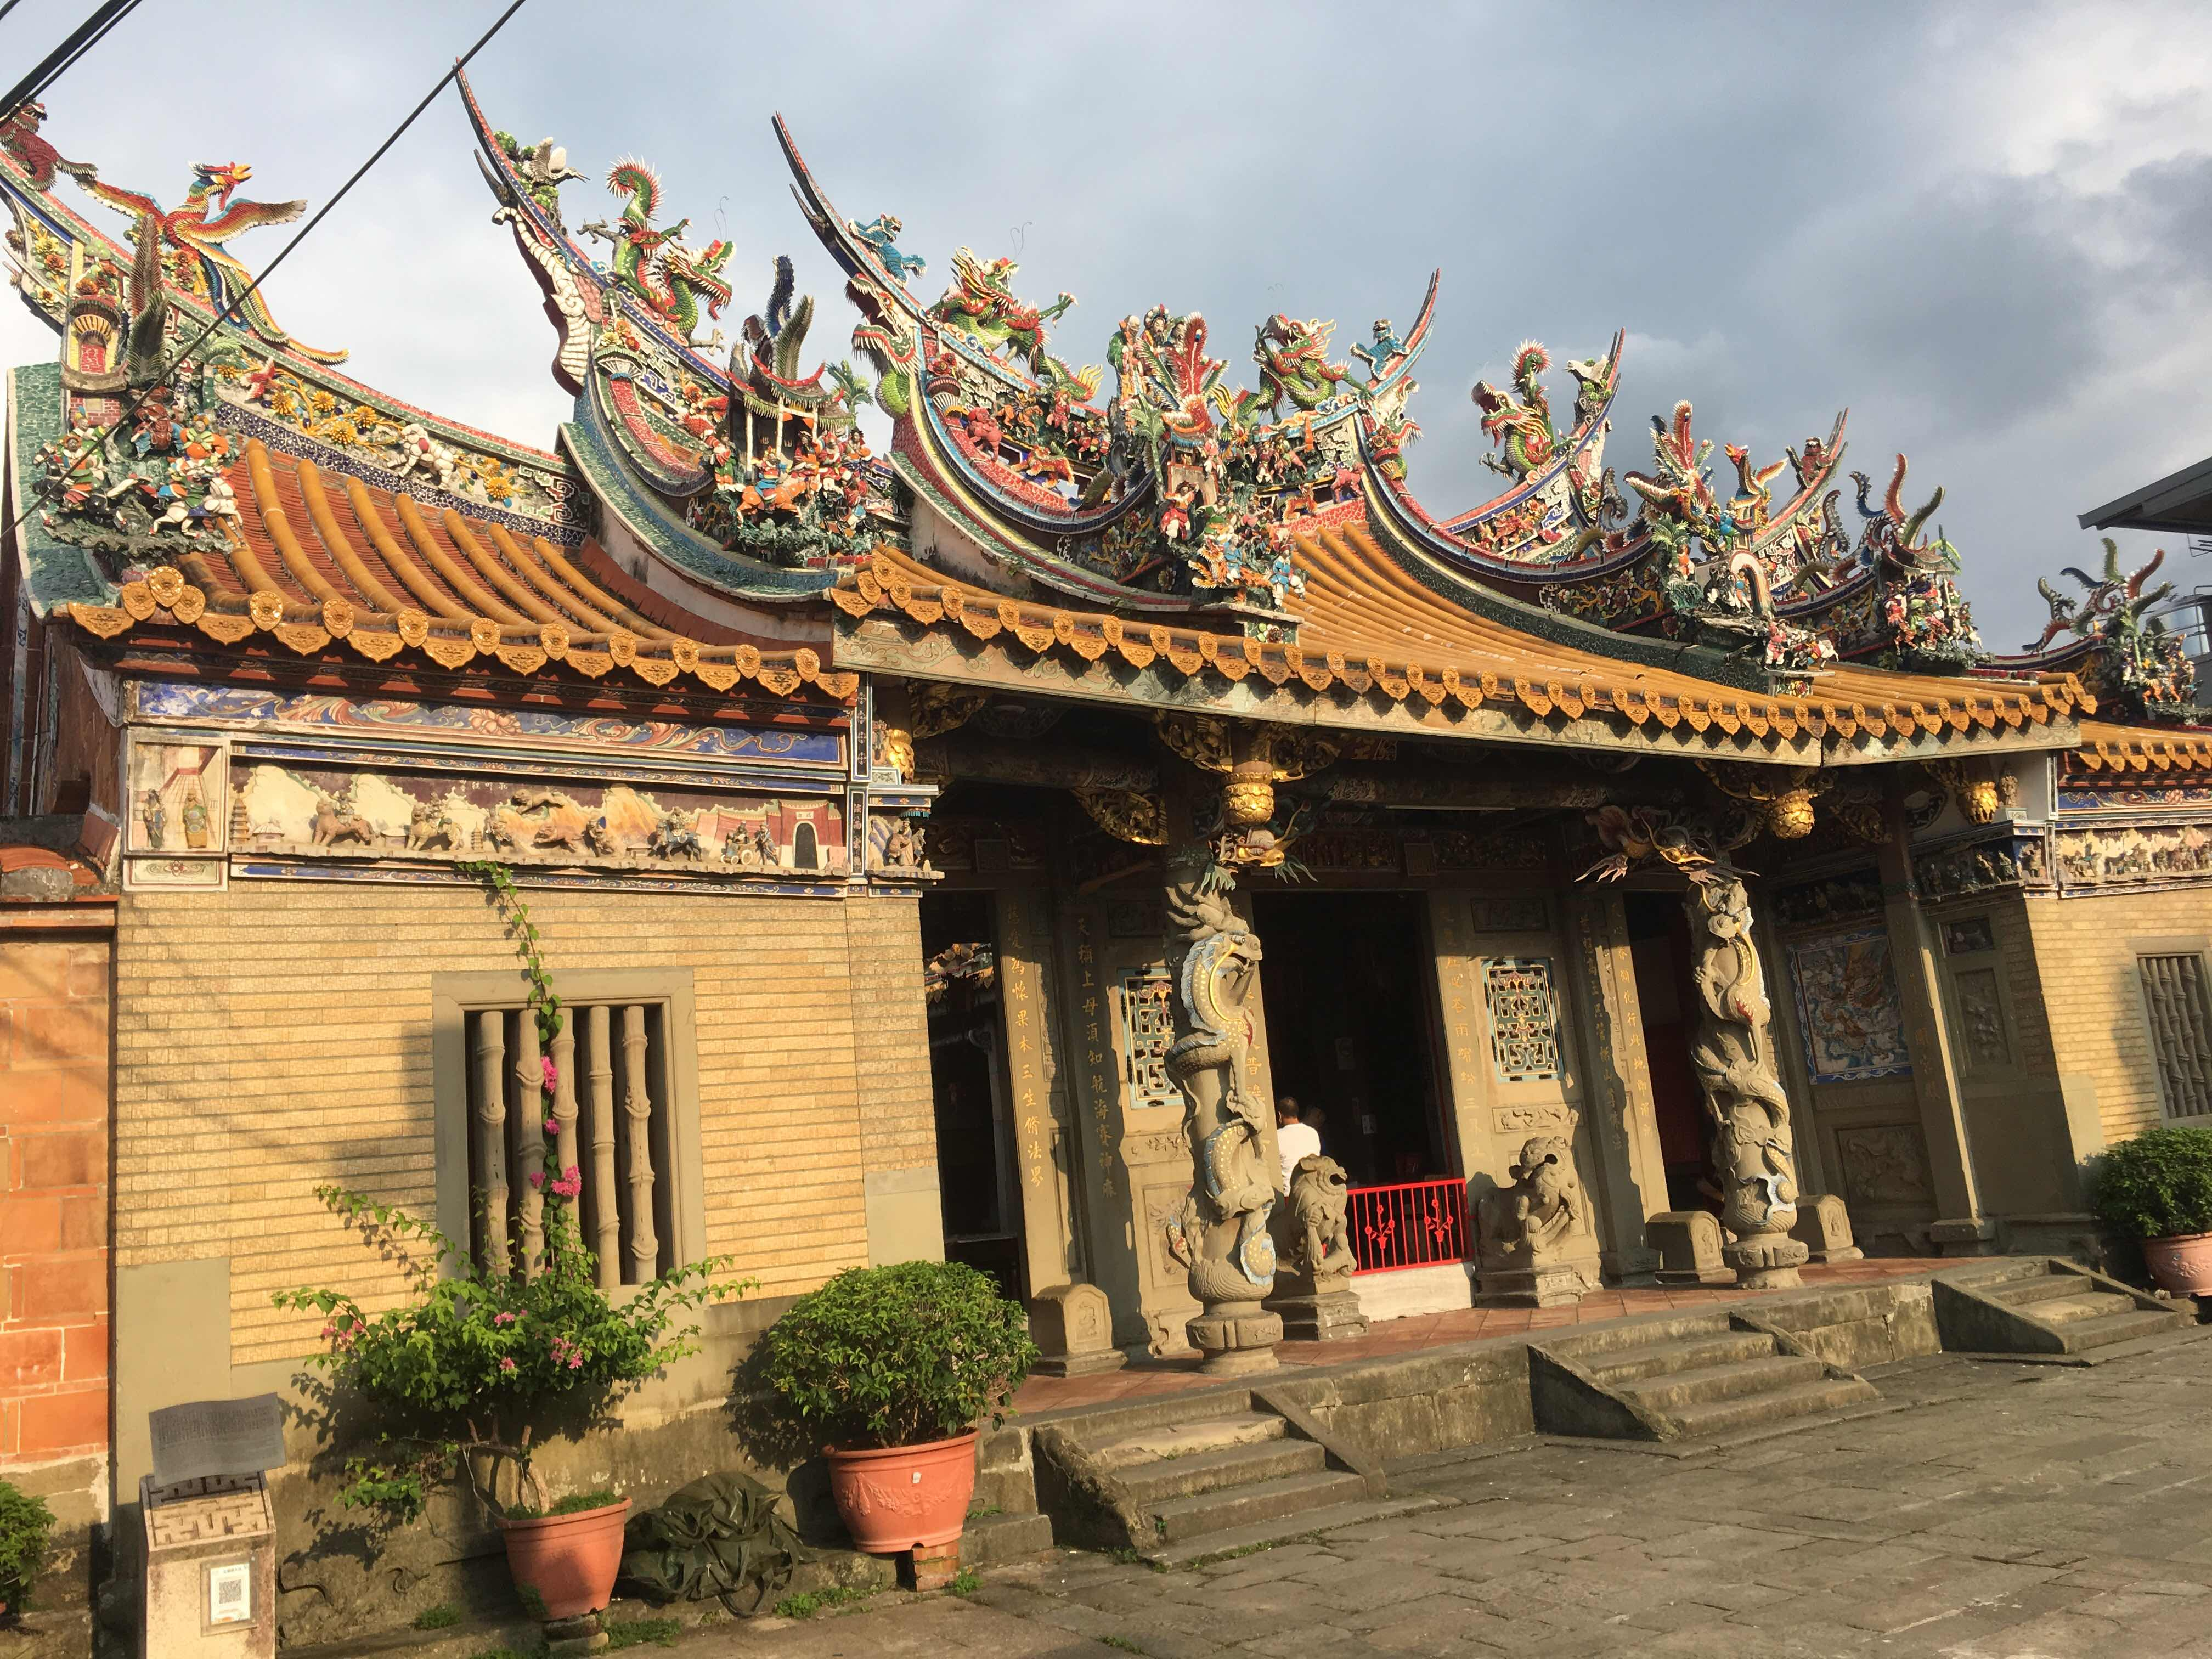 beipu old street beipu hakka culture hakka village hsinchu Taiwan citian temple